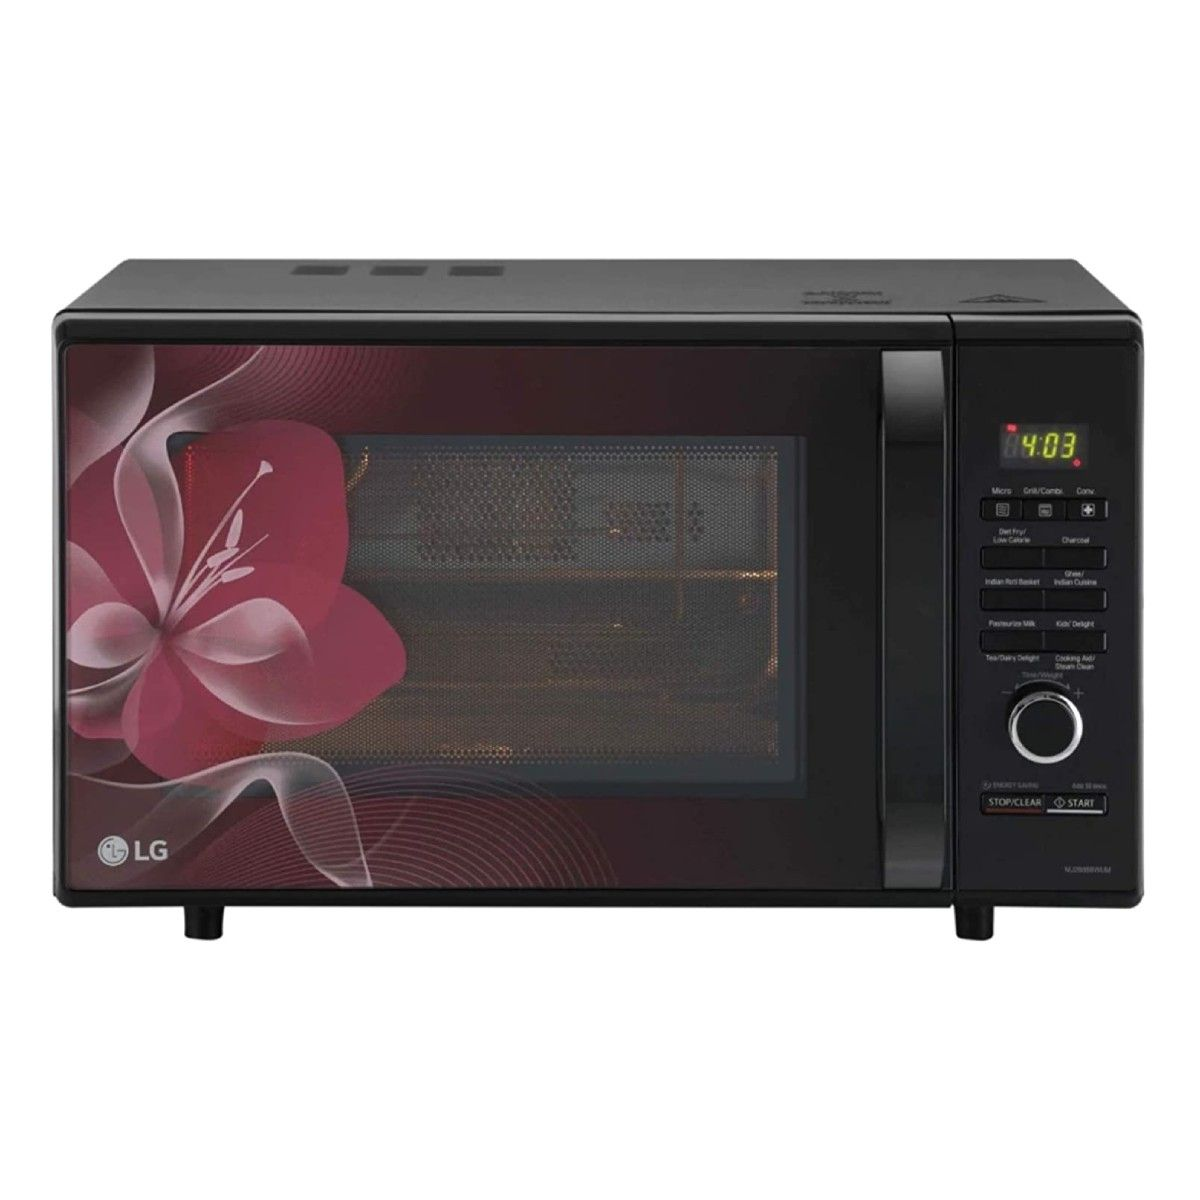 एलजी MJ2886BWUM 28 L Convection Microwave Oven